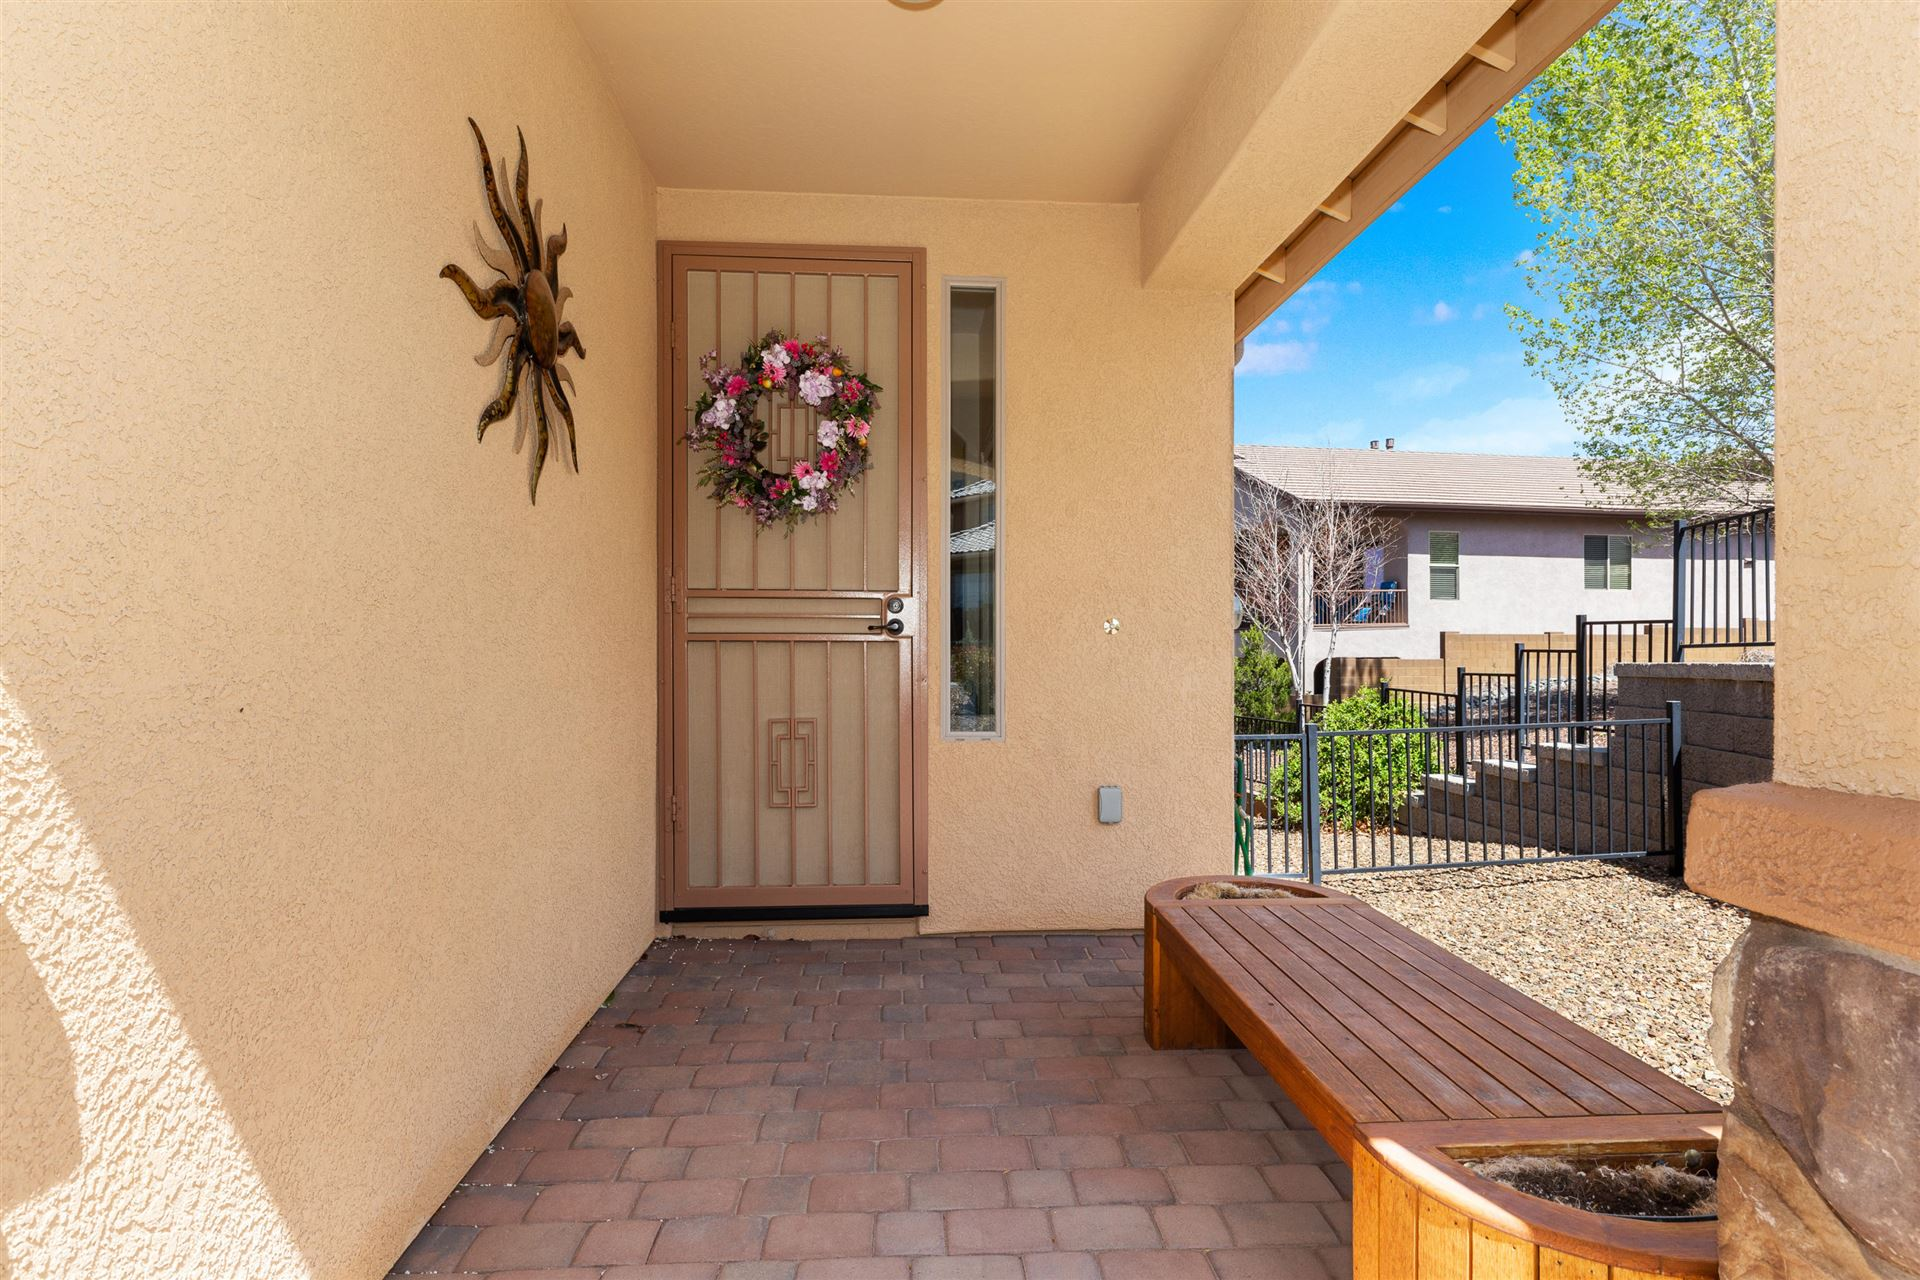 Photo of 346 Dreamweaver Drive #Lot: 10, Prescott, AZ 86301 (MLS # 1037627)